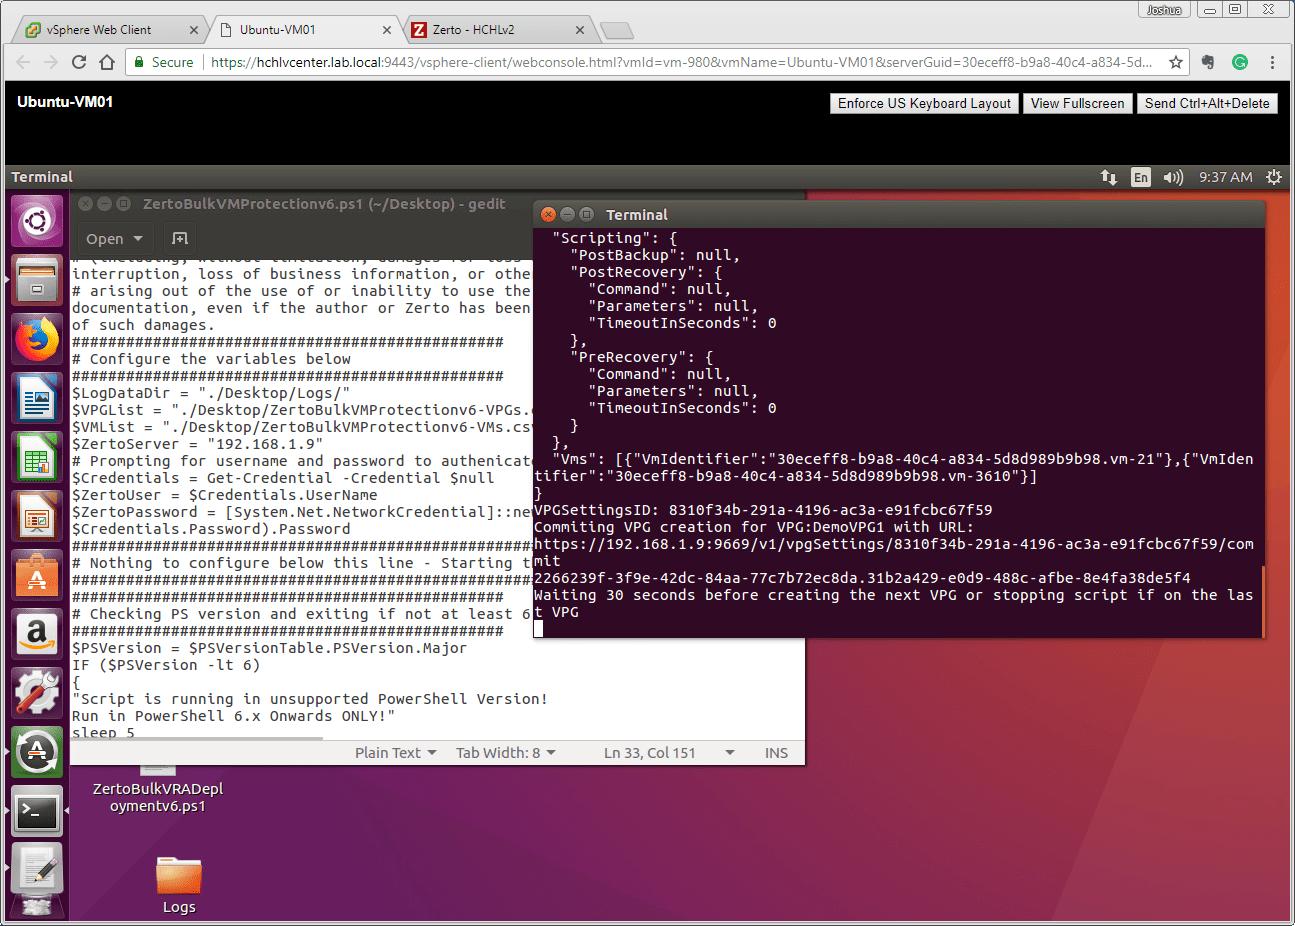 BulkVMProtectionUbuntuScreenshot